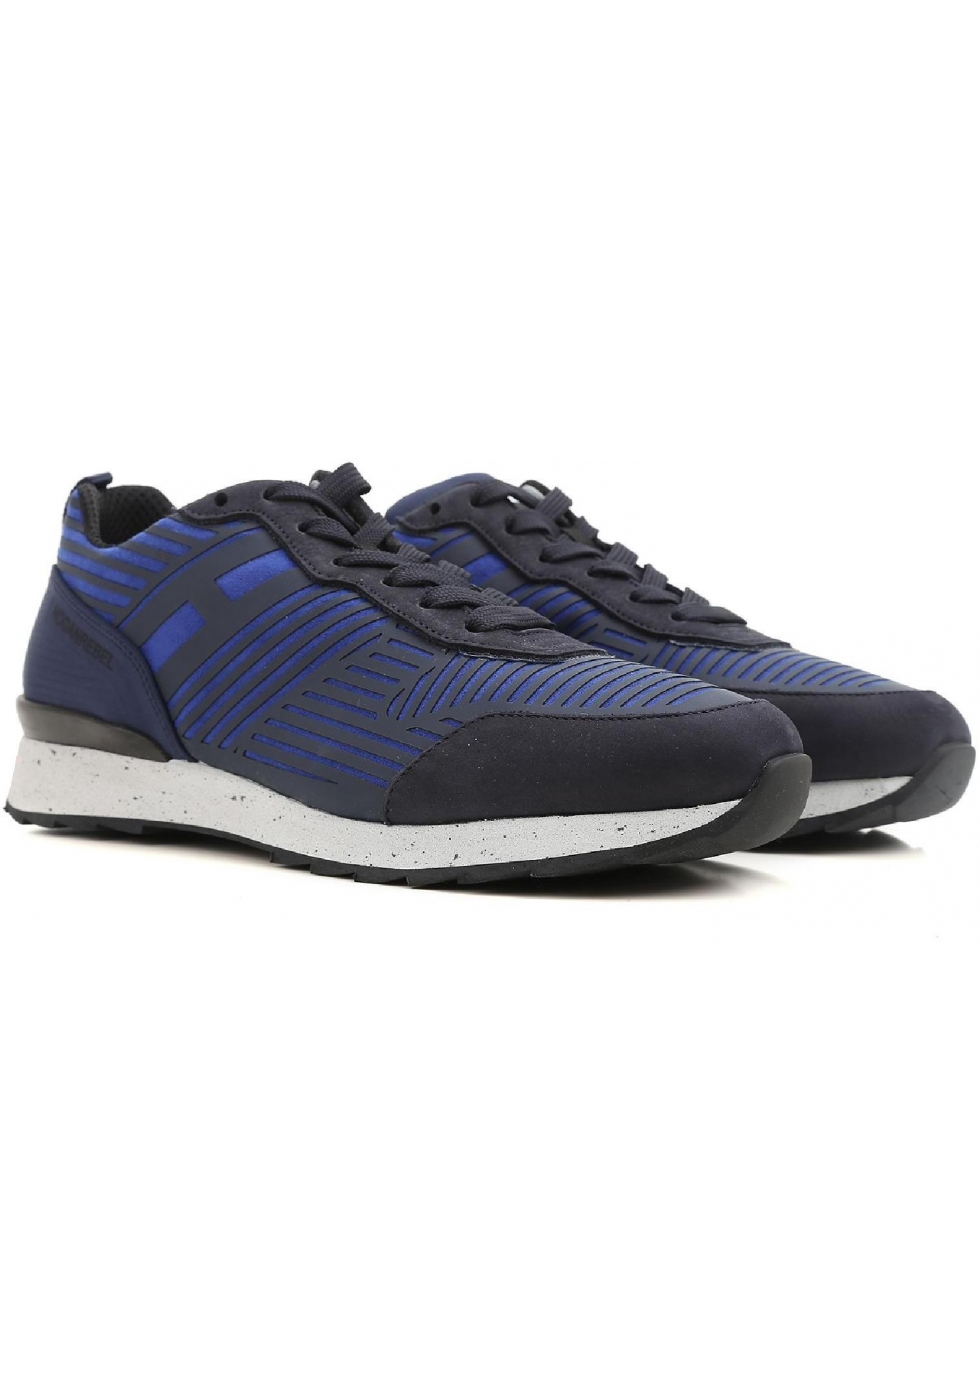 best loved 6d603 983e9 Sneakers Hogan Rebel uomo in pelle e tessuto blu - Italian ...